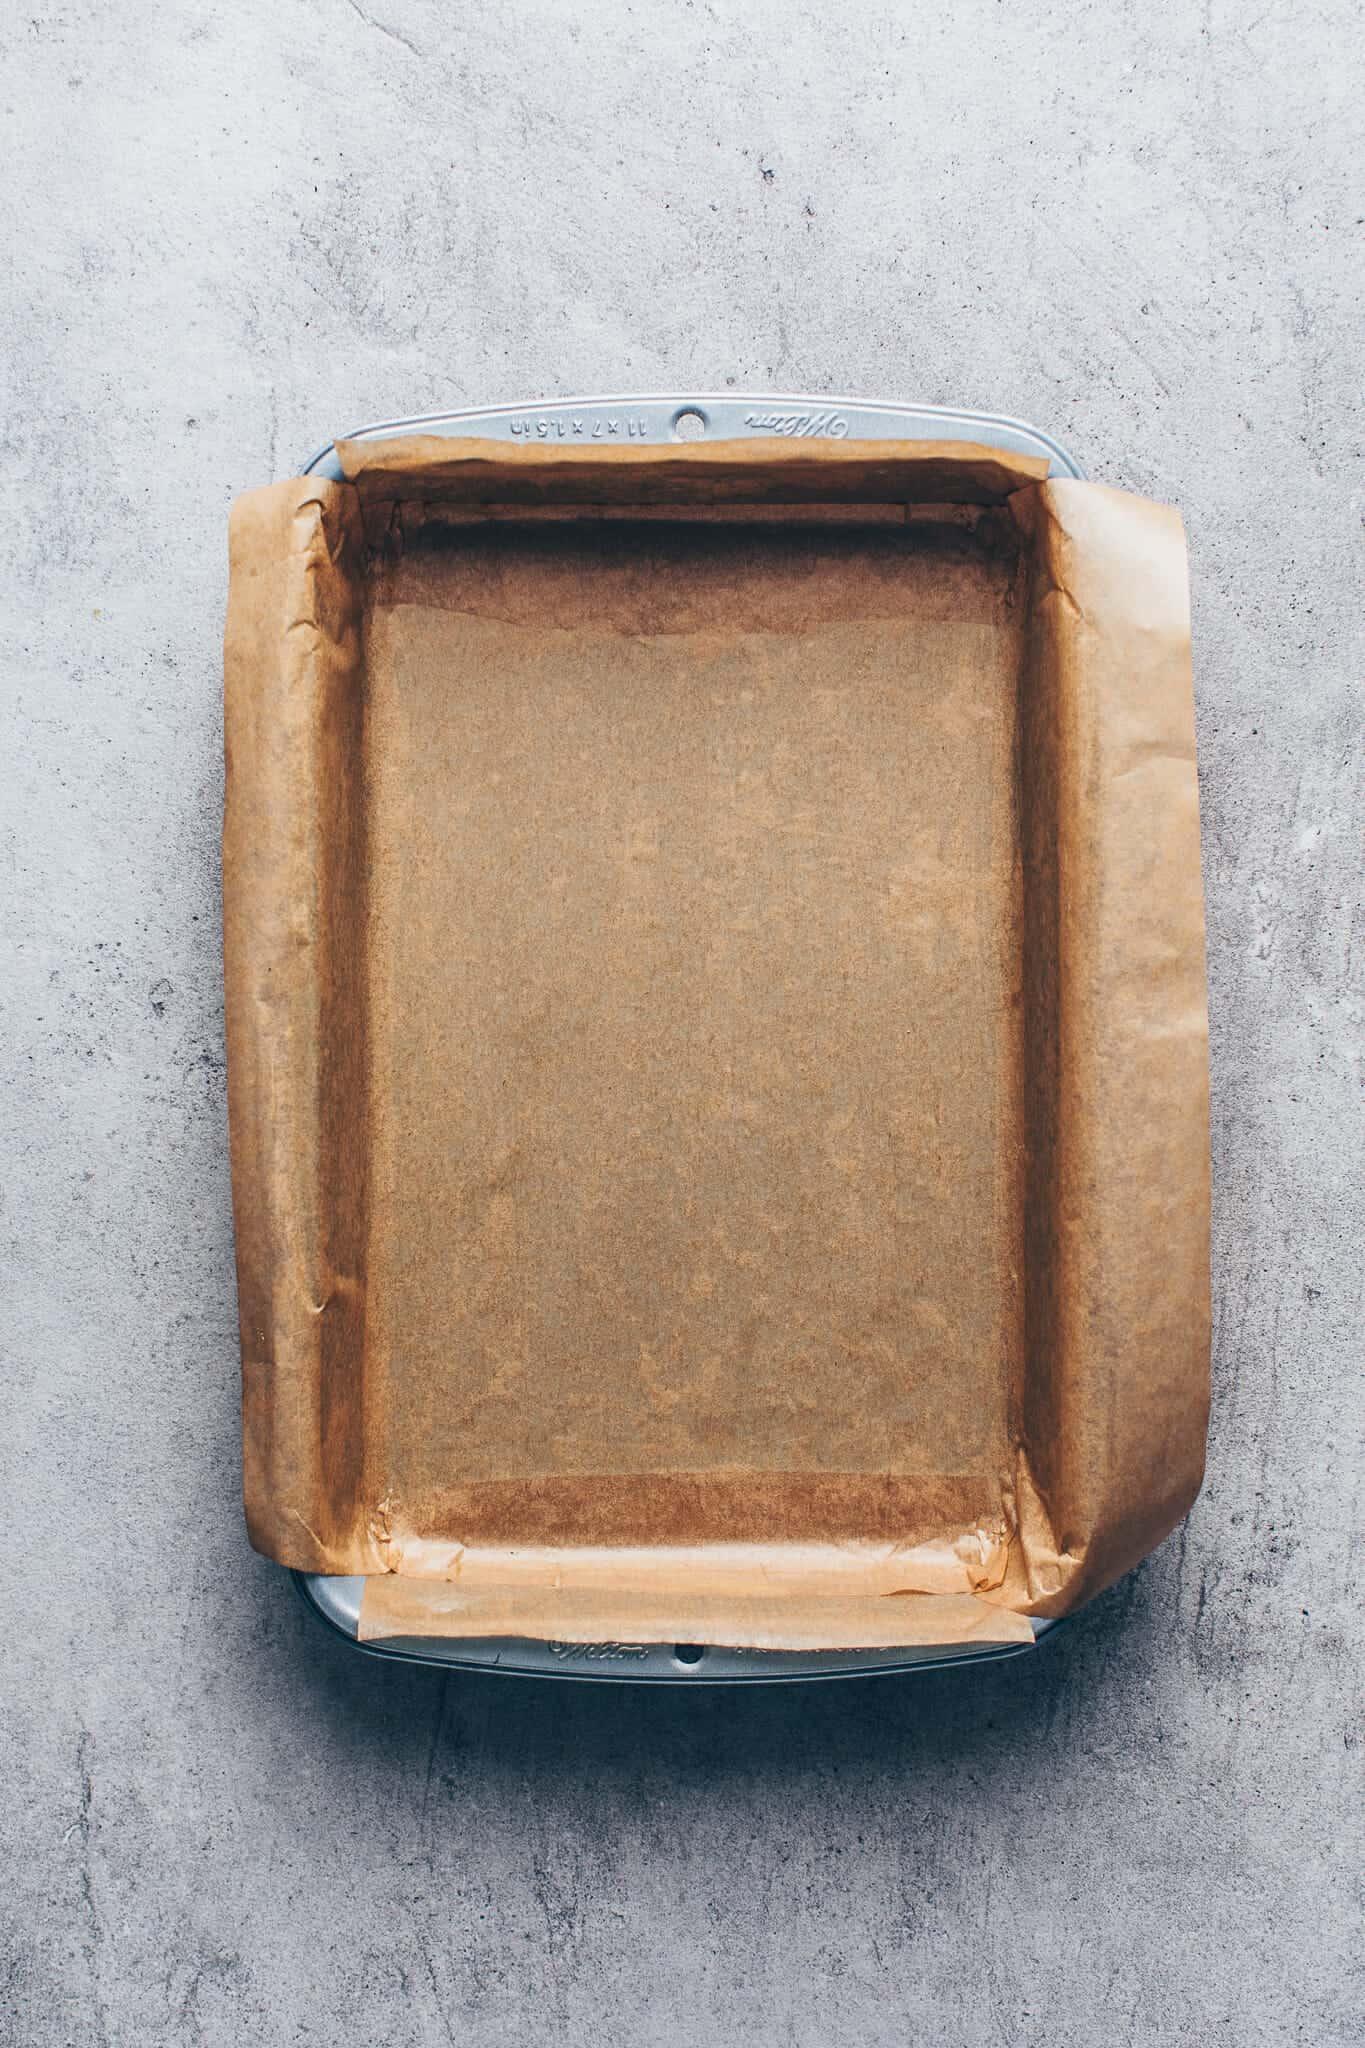 Prepared Baking pan for chocolate cake